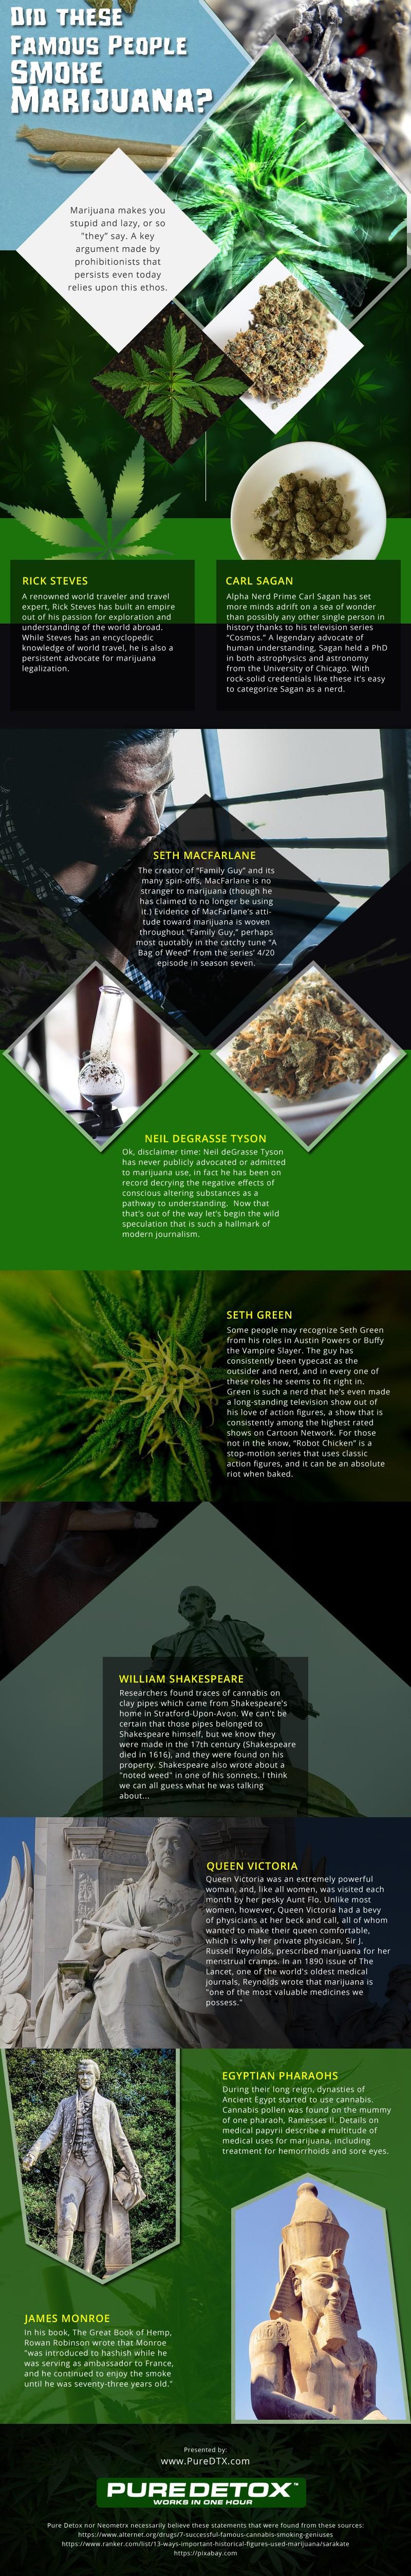 Famous-People-Who-Smoke-Marijuana Infographic